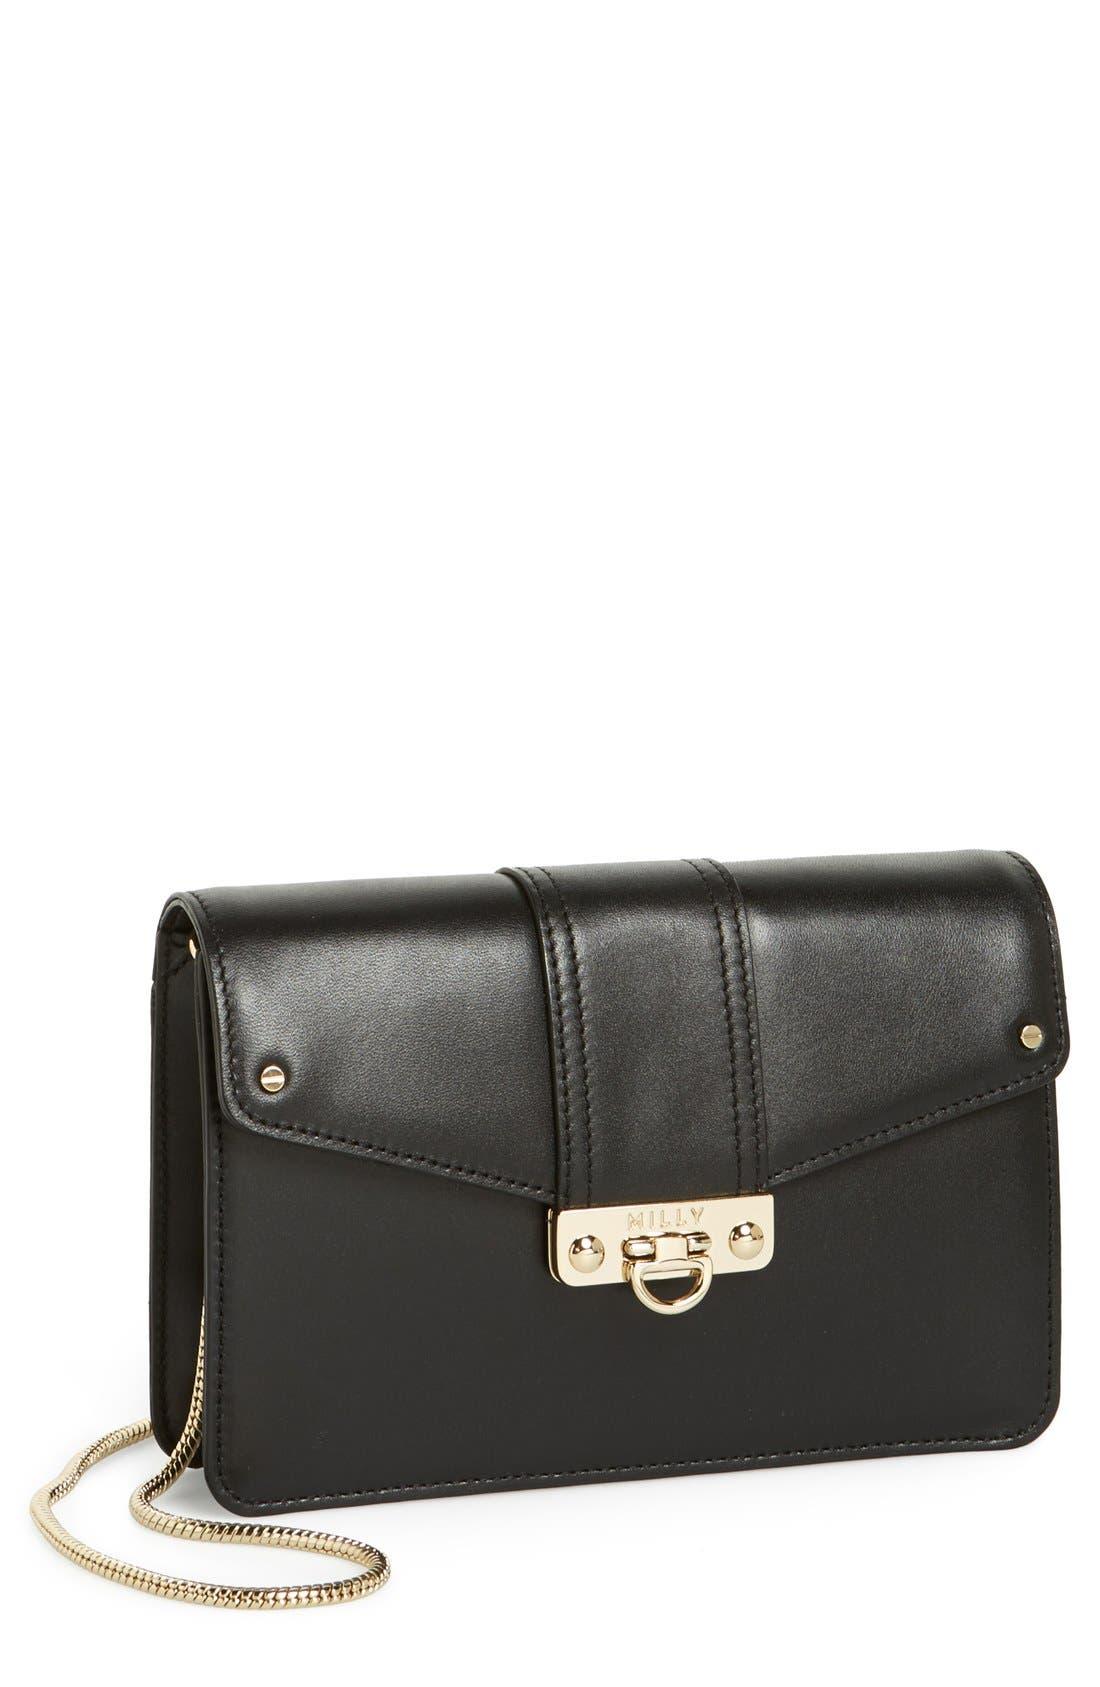 Main Image - Milly 'Mini Bryant' Leather Crossbody Bag